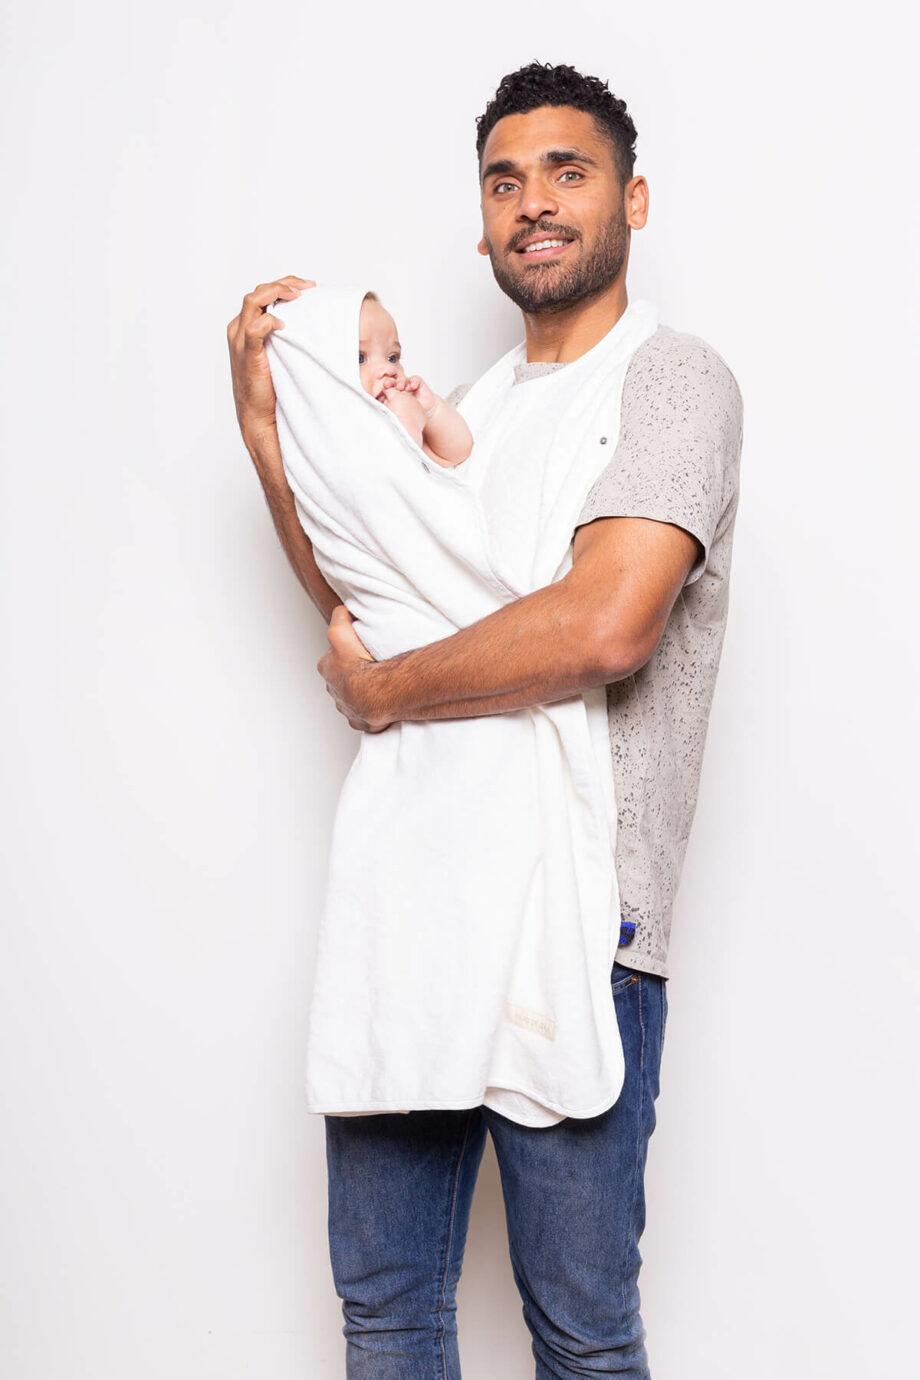 Vader met witte babyhanddoek - Palais de leau